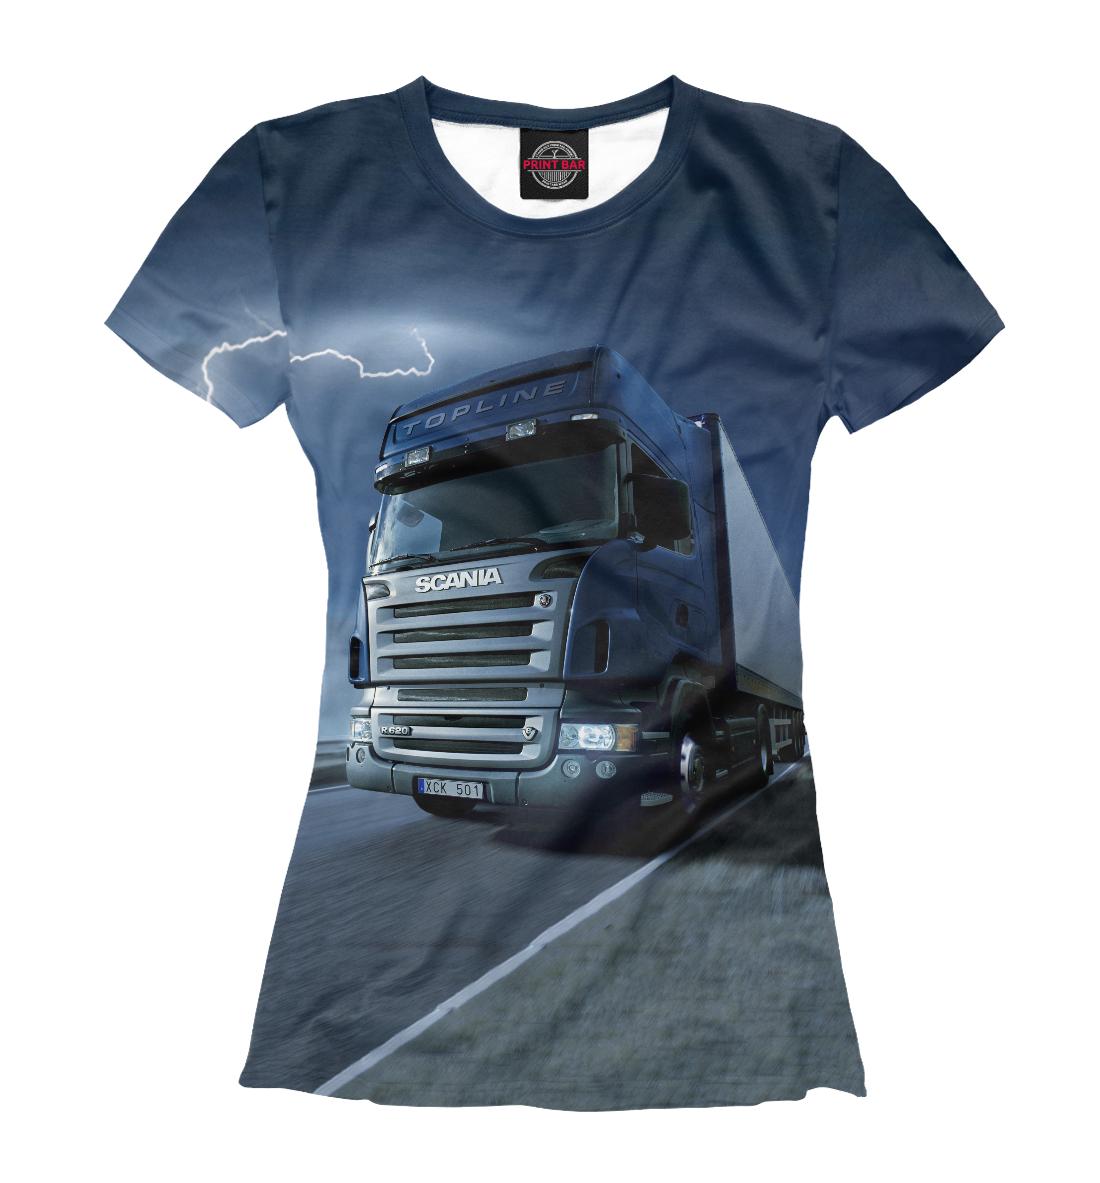 Купить Scania, Printbar, Футболки, GRZ-690904-fut-1